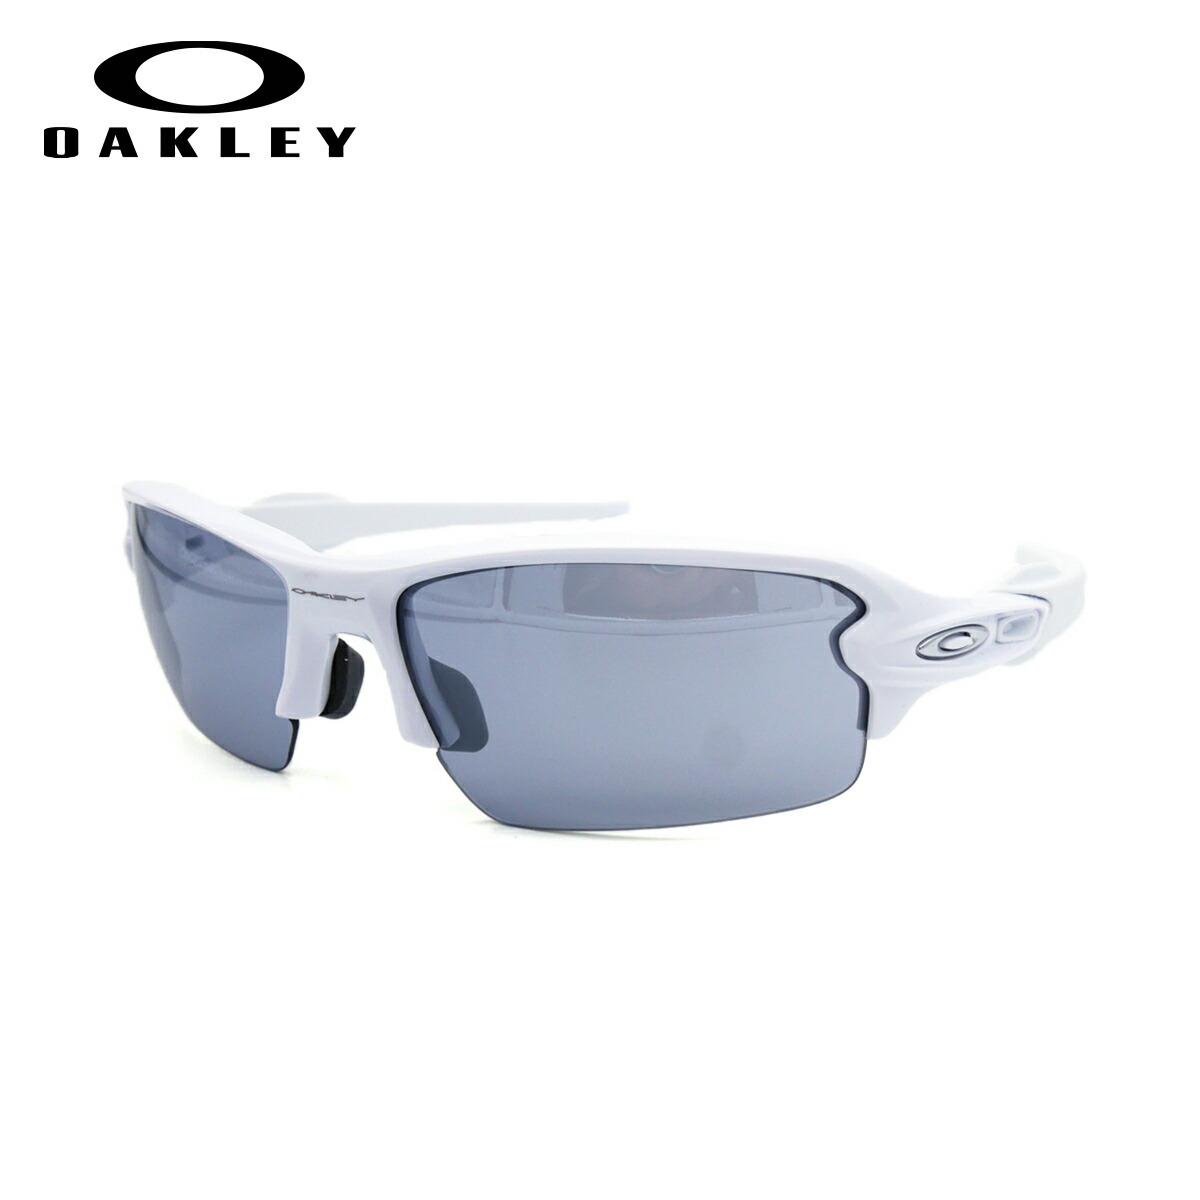 OAKLEY FLAK 2.0 (A) OO9271-16 オークリー フラック2.0 アジアフィット サングラス 【送料無料】スポーツ 男性 女性 メンズ レディース ゴルフ ロードバイク 自転車 野球